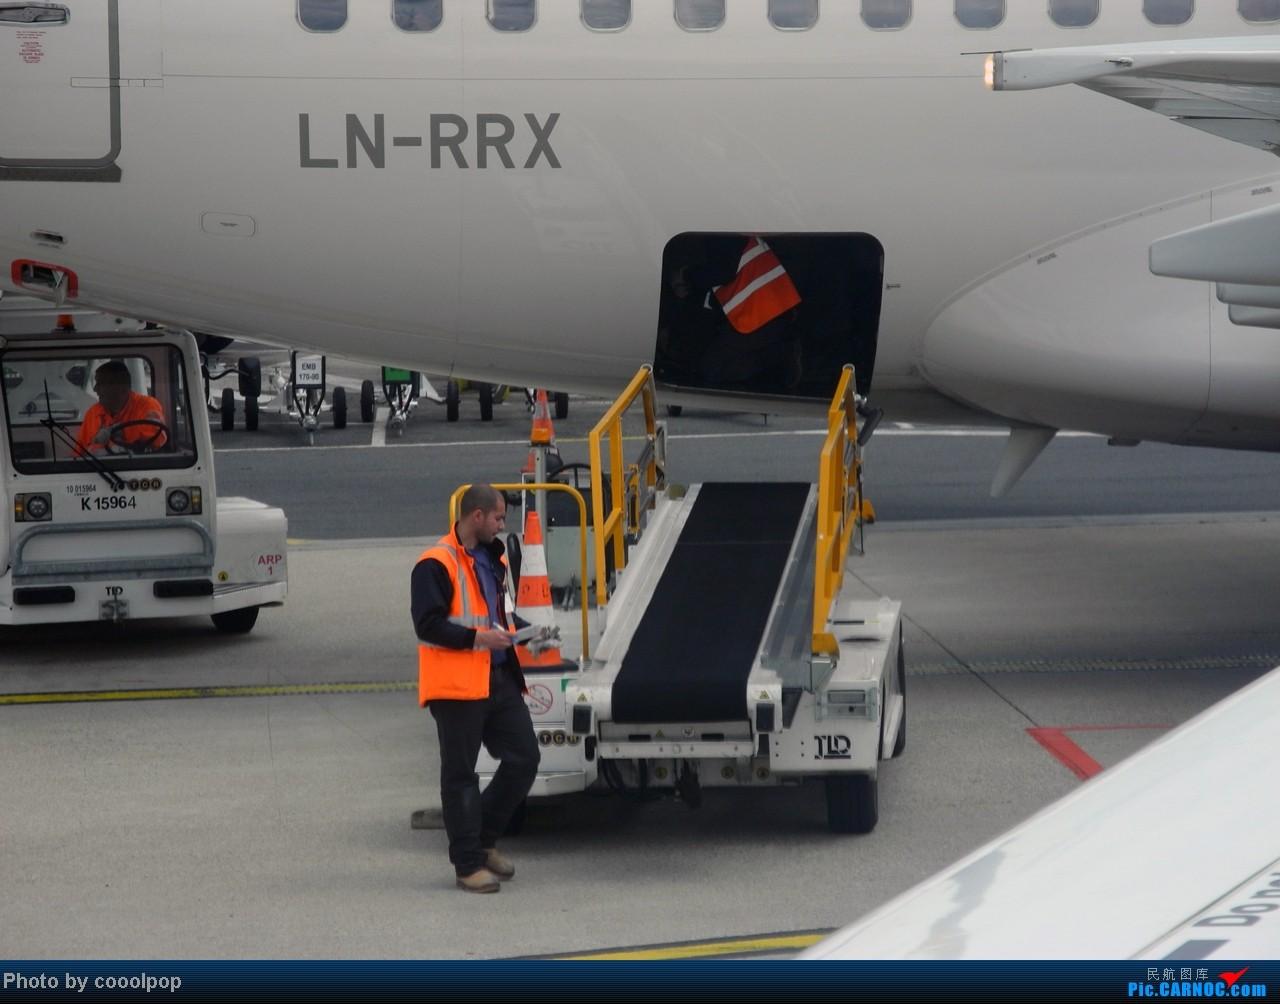 Re:[原创]继续继续! 巴黎凡尔赛宫!以及巴黎 经停 法兰克福 回北京!! 继续我的汉莎之旅!(2014年第5帖) BOEING 737-683 LN-RRX 法国戴高乐机场